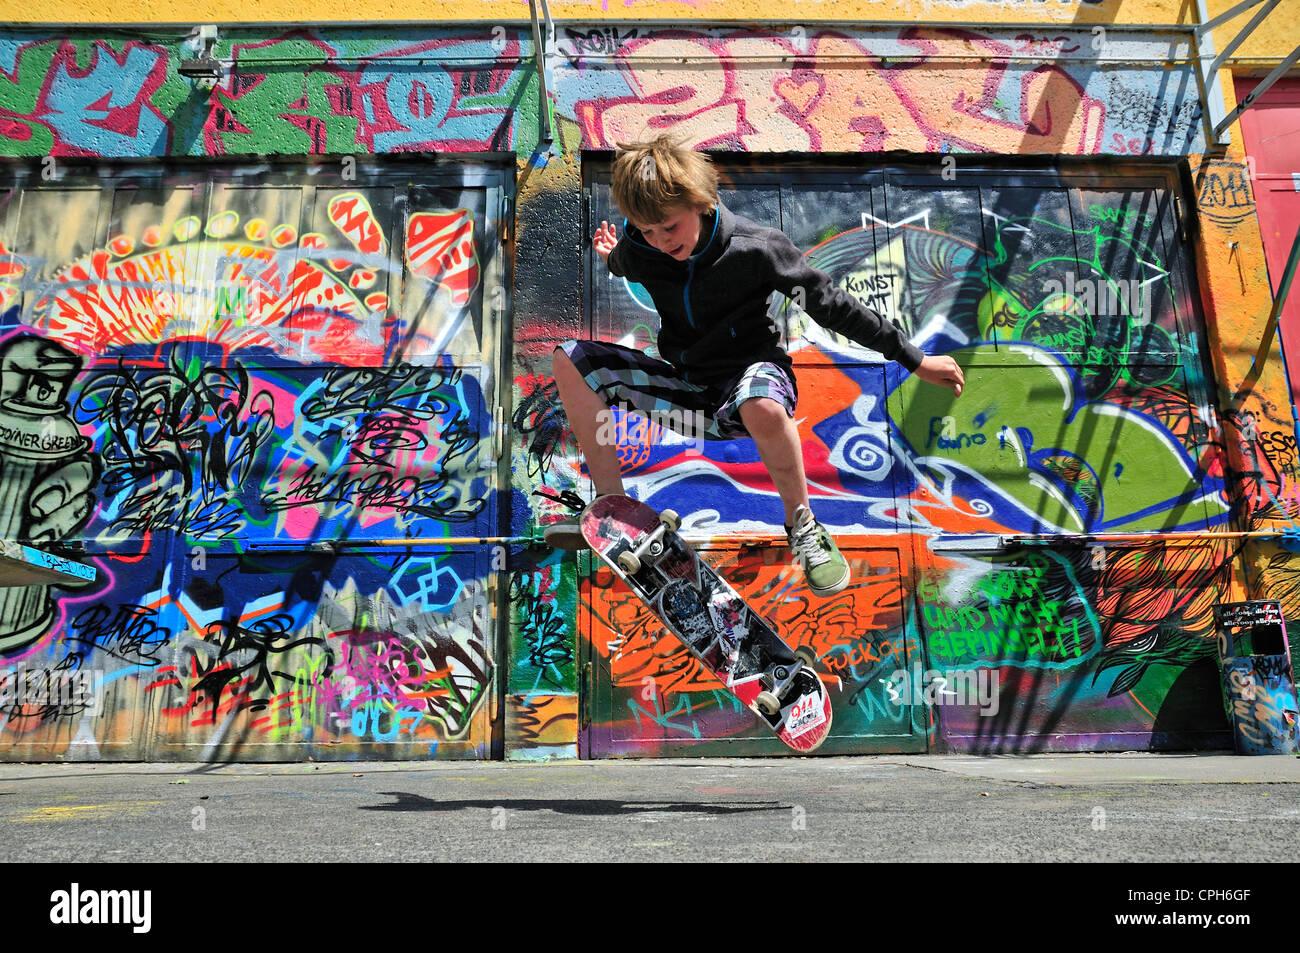 Graffiti wall activity - Boy Germany 11 Europe Leisure Activity Graffiti Wall Youth Culture Boy Kick Flip Kid Child Cologne Model Release N